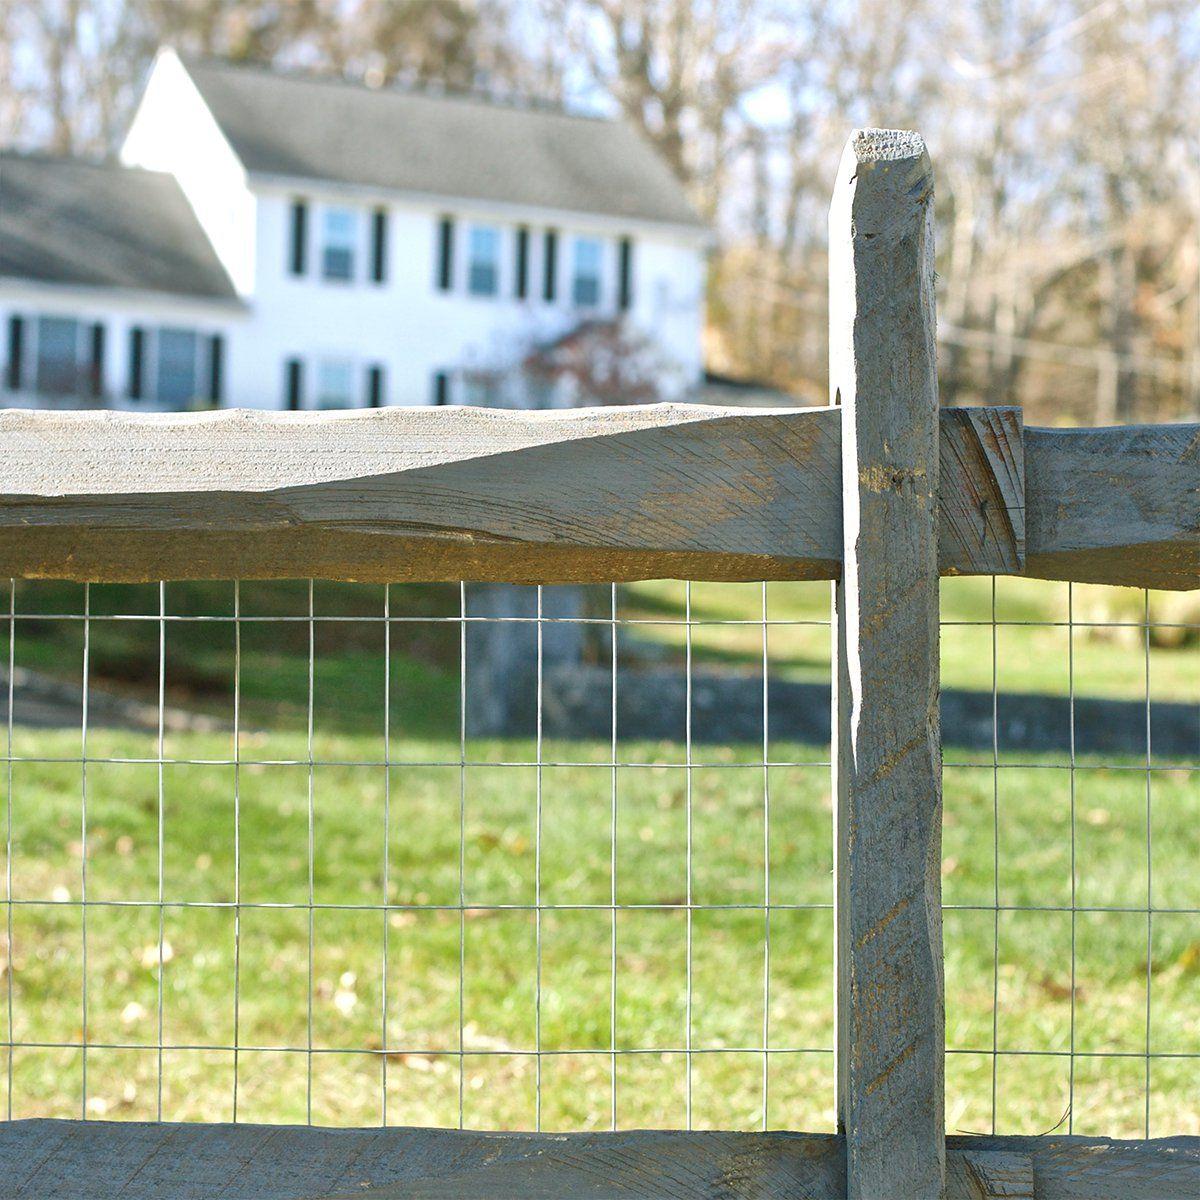 Expert Gardener Galvanized Steel Gray Welded Wire Fence 36 X 50 Roll Walmart Com In 2020 Welded Wire Fence Rustic Garden Fence Wire Fence